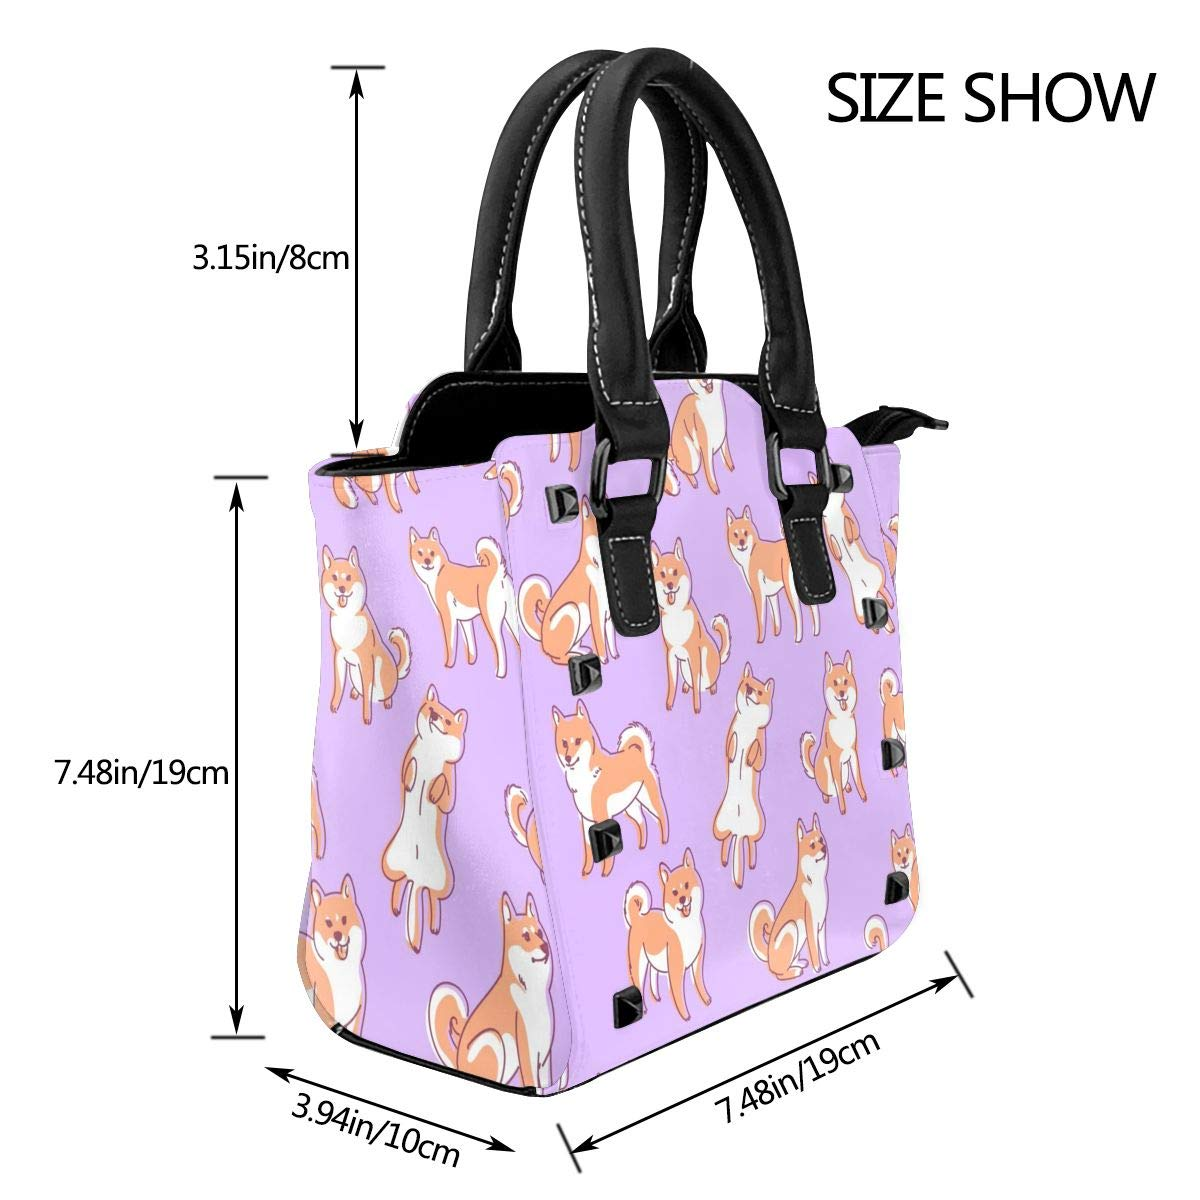 Pit Bull hund husdjur leende kvinnor exklusivt mode utsökt elegant äkta läder nit axelväska Cute Shiba Inu Dog